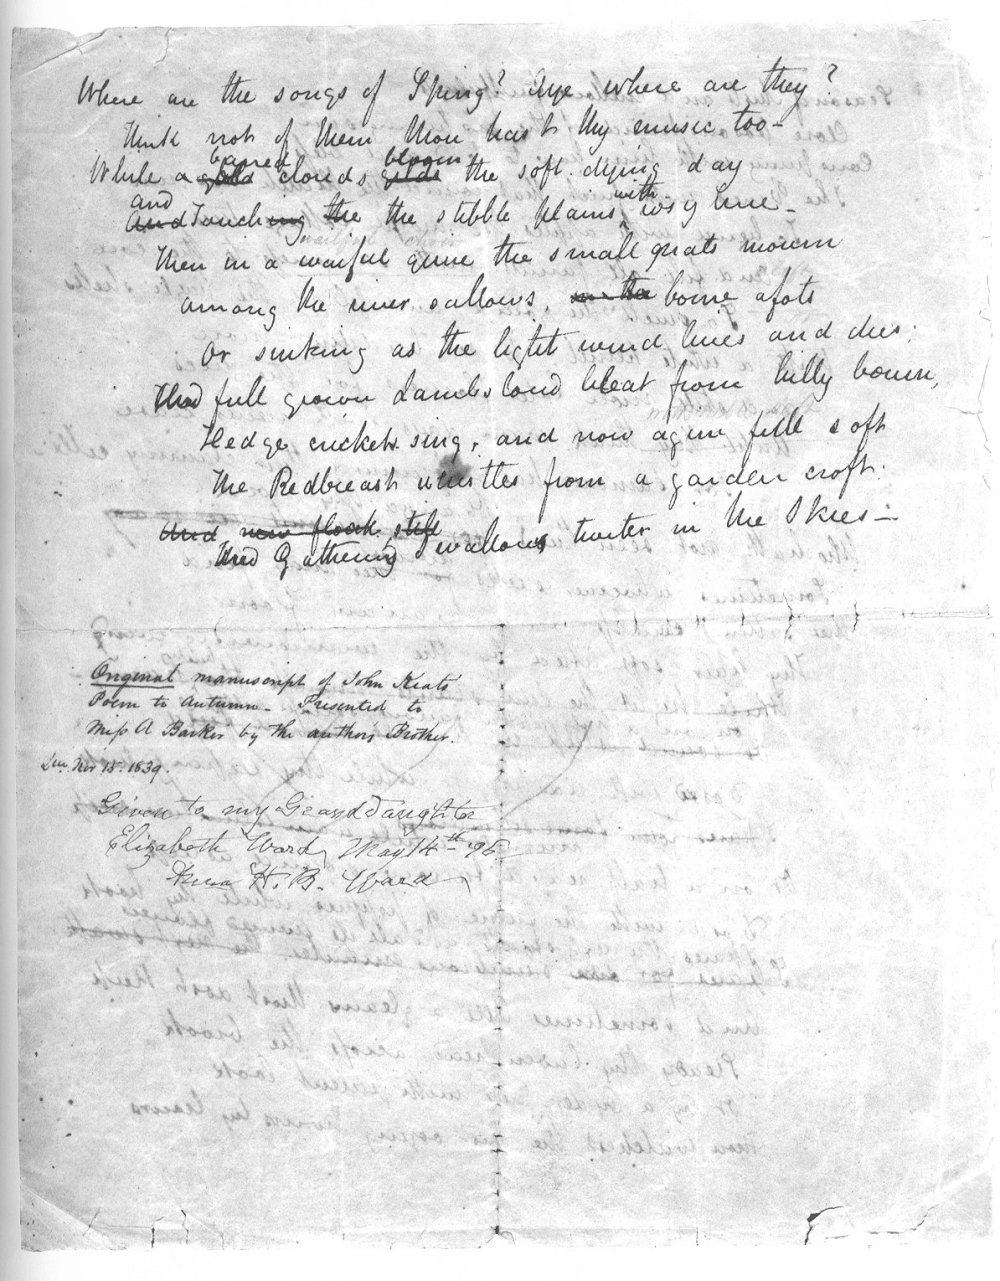 John_Keats_-_To_Autumn_Manuscript_2_unrestored